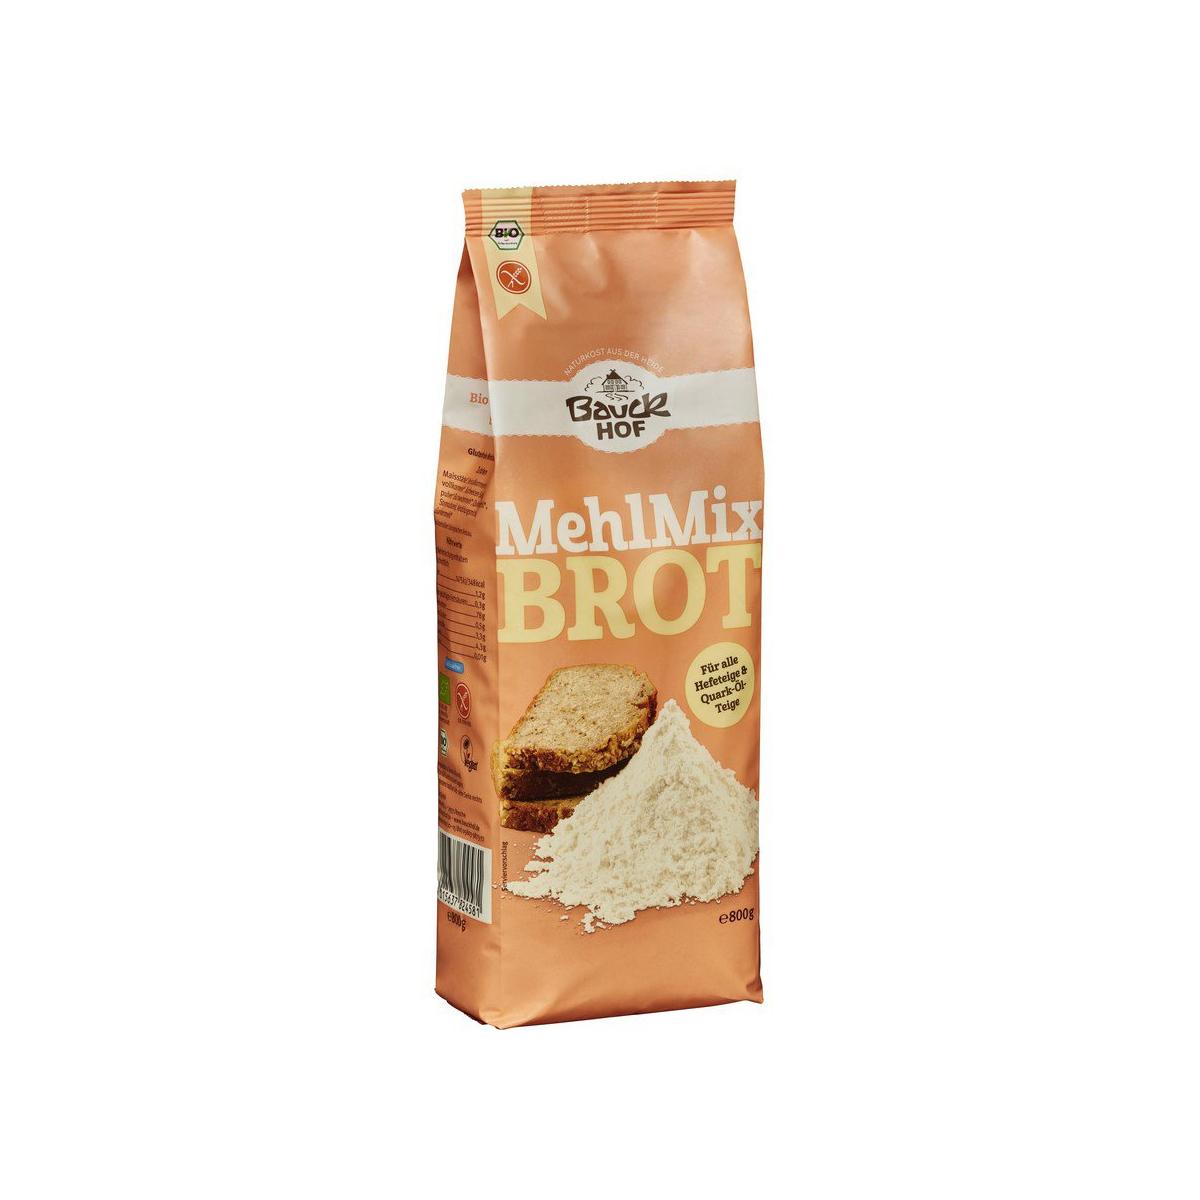 Mehlmix Brot glutenfrei